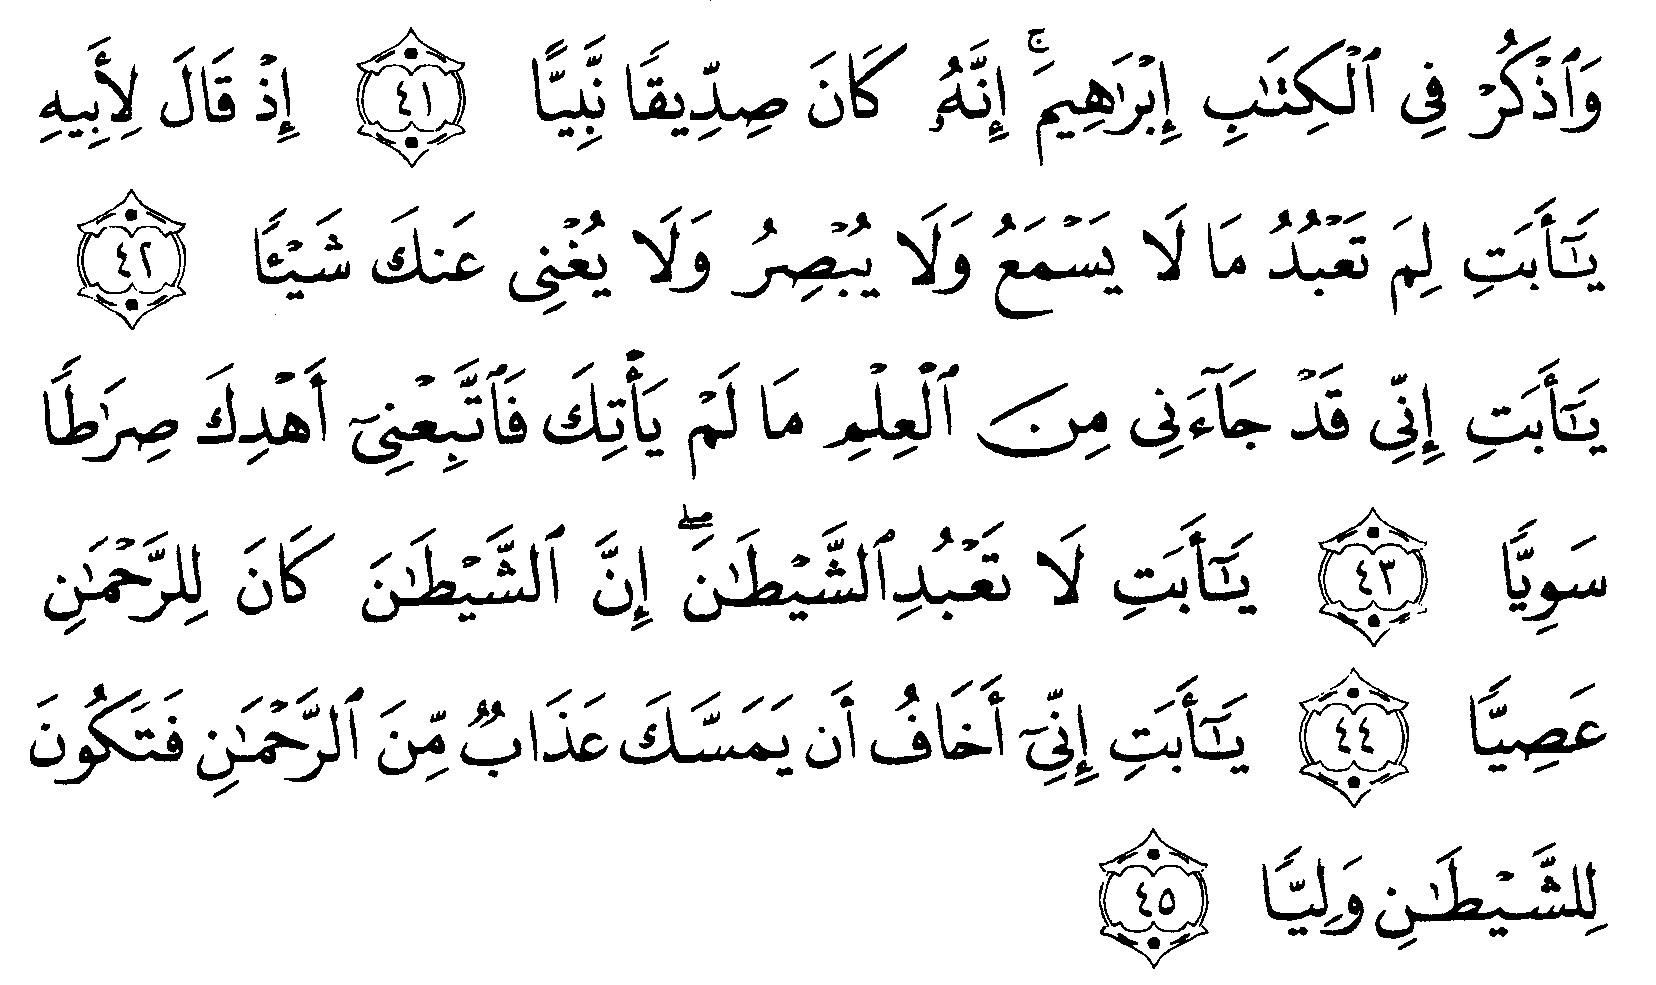 Tafsir Ibnu Katsir Surah Maryam Ayat 41 45 Alquranmulia